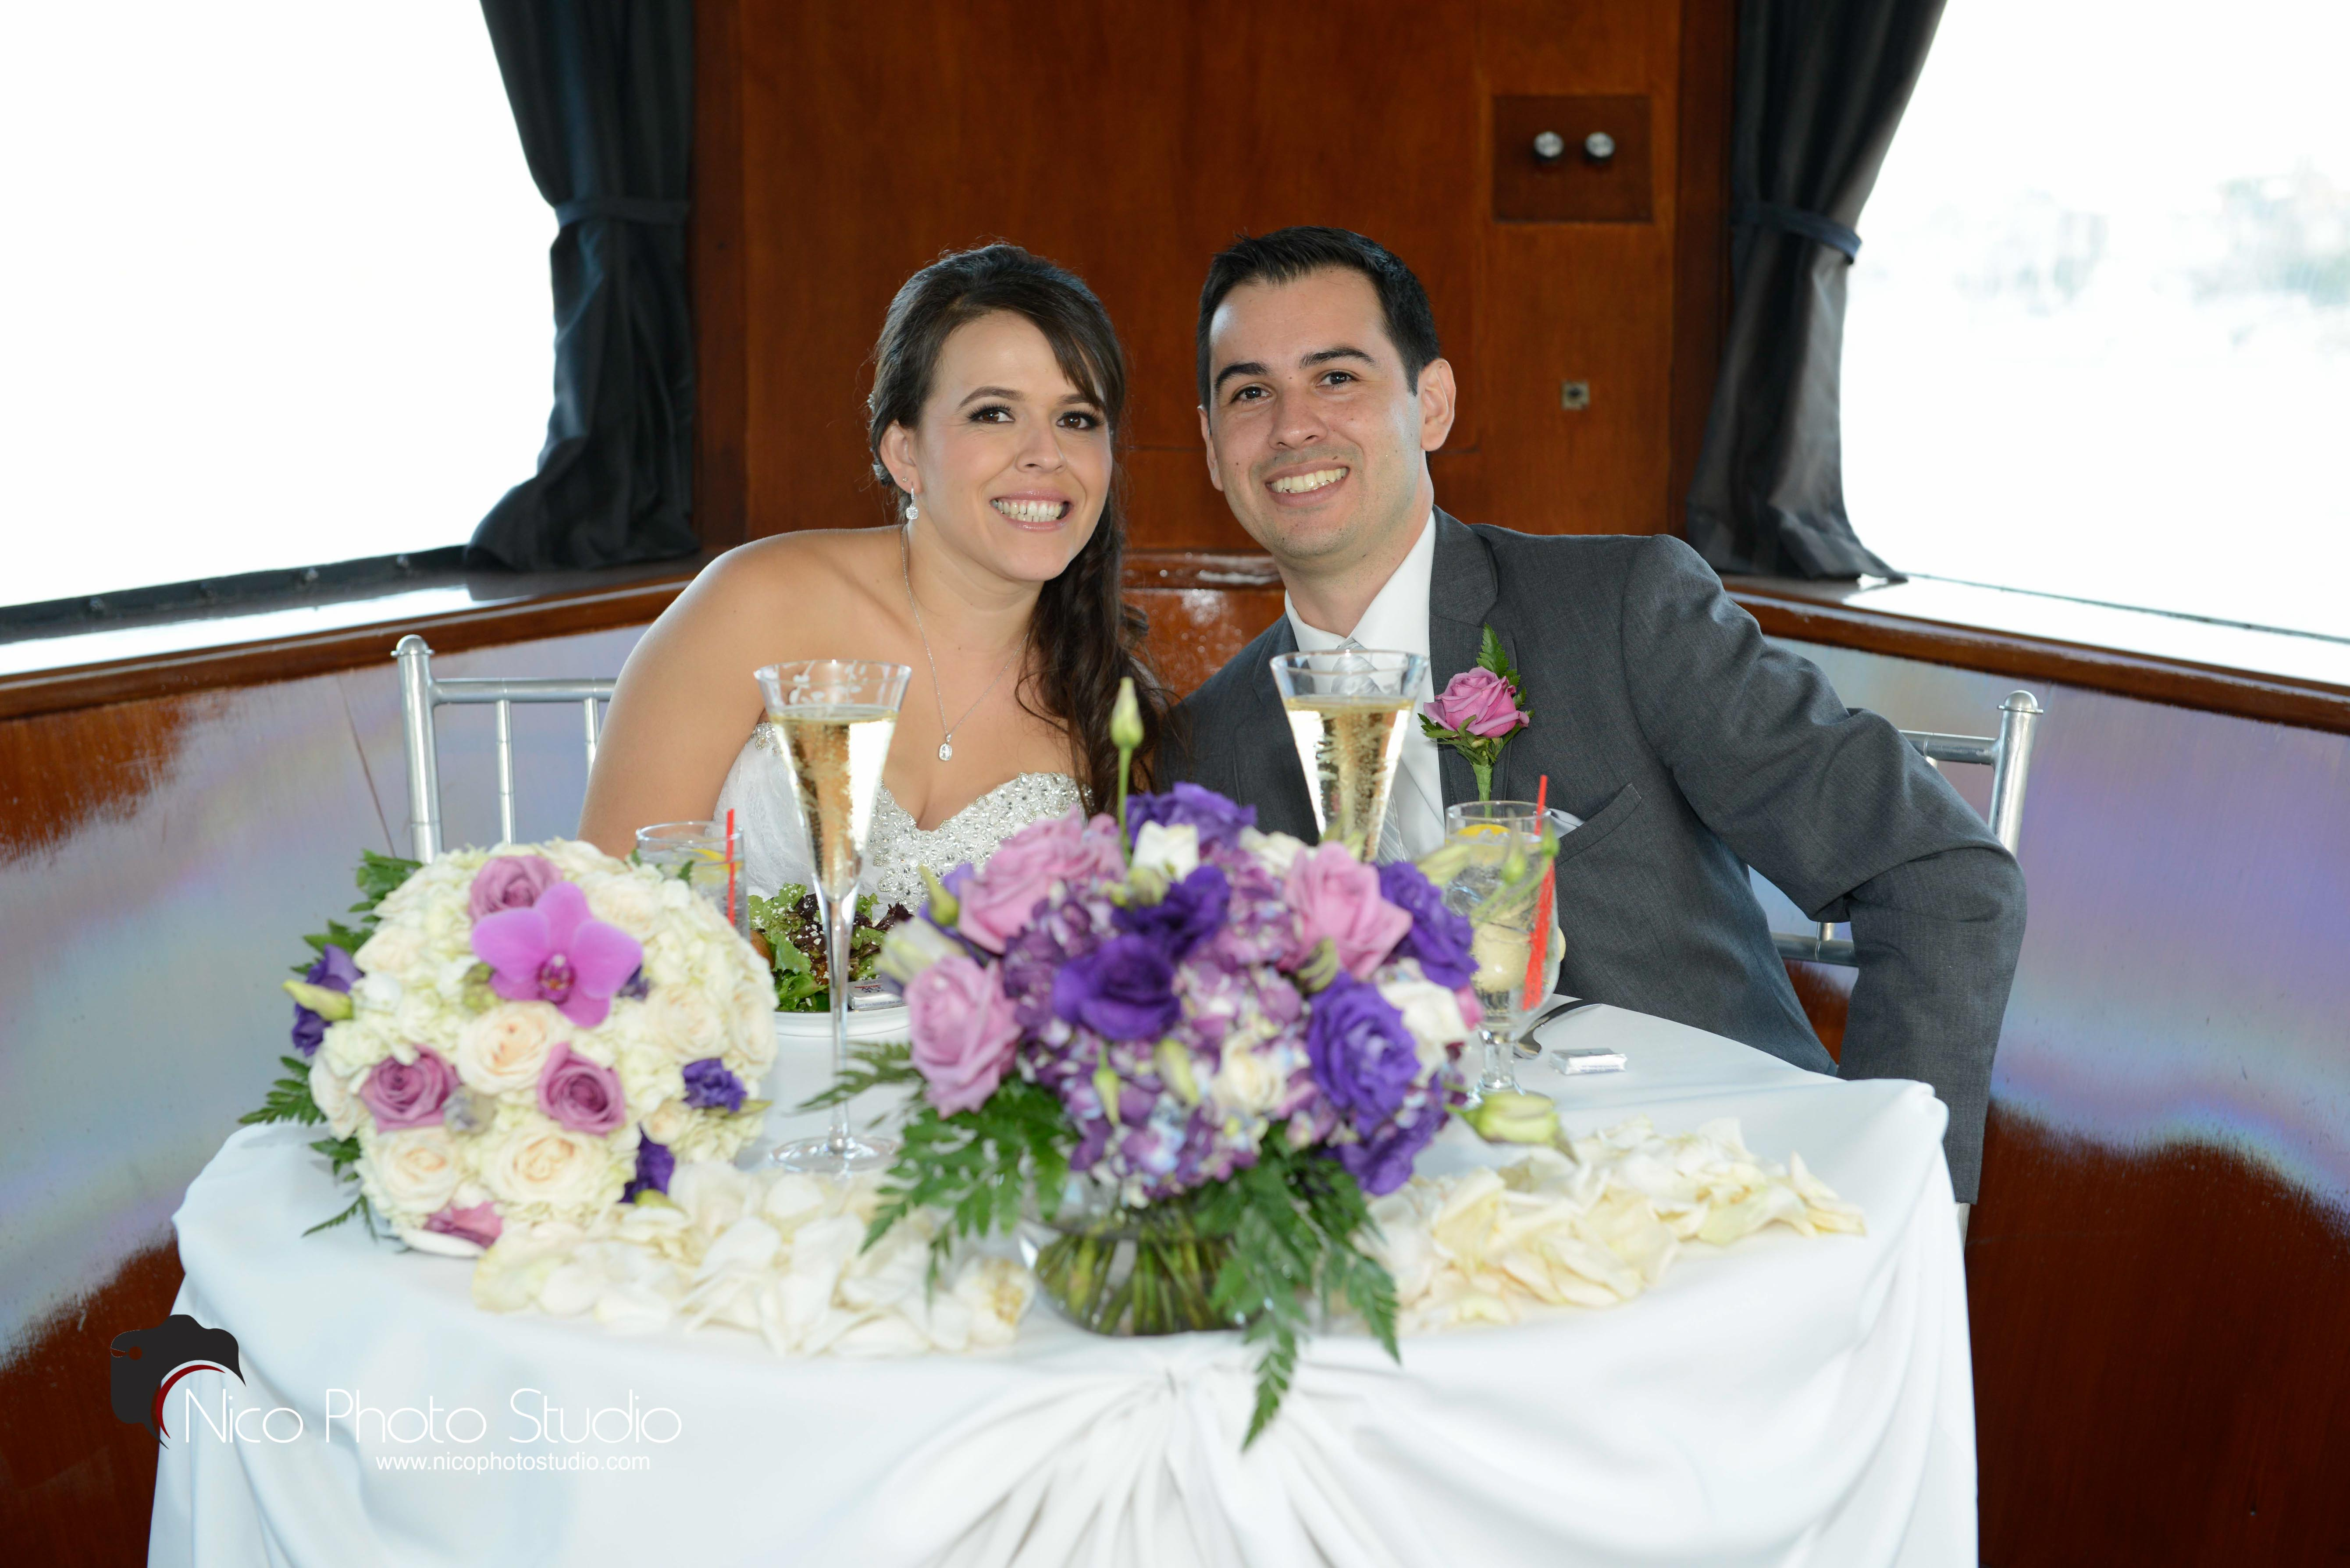 Vanessa and Miguel